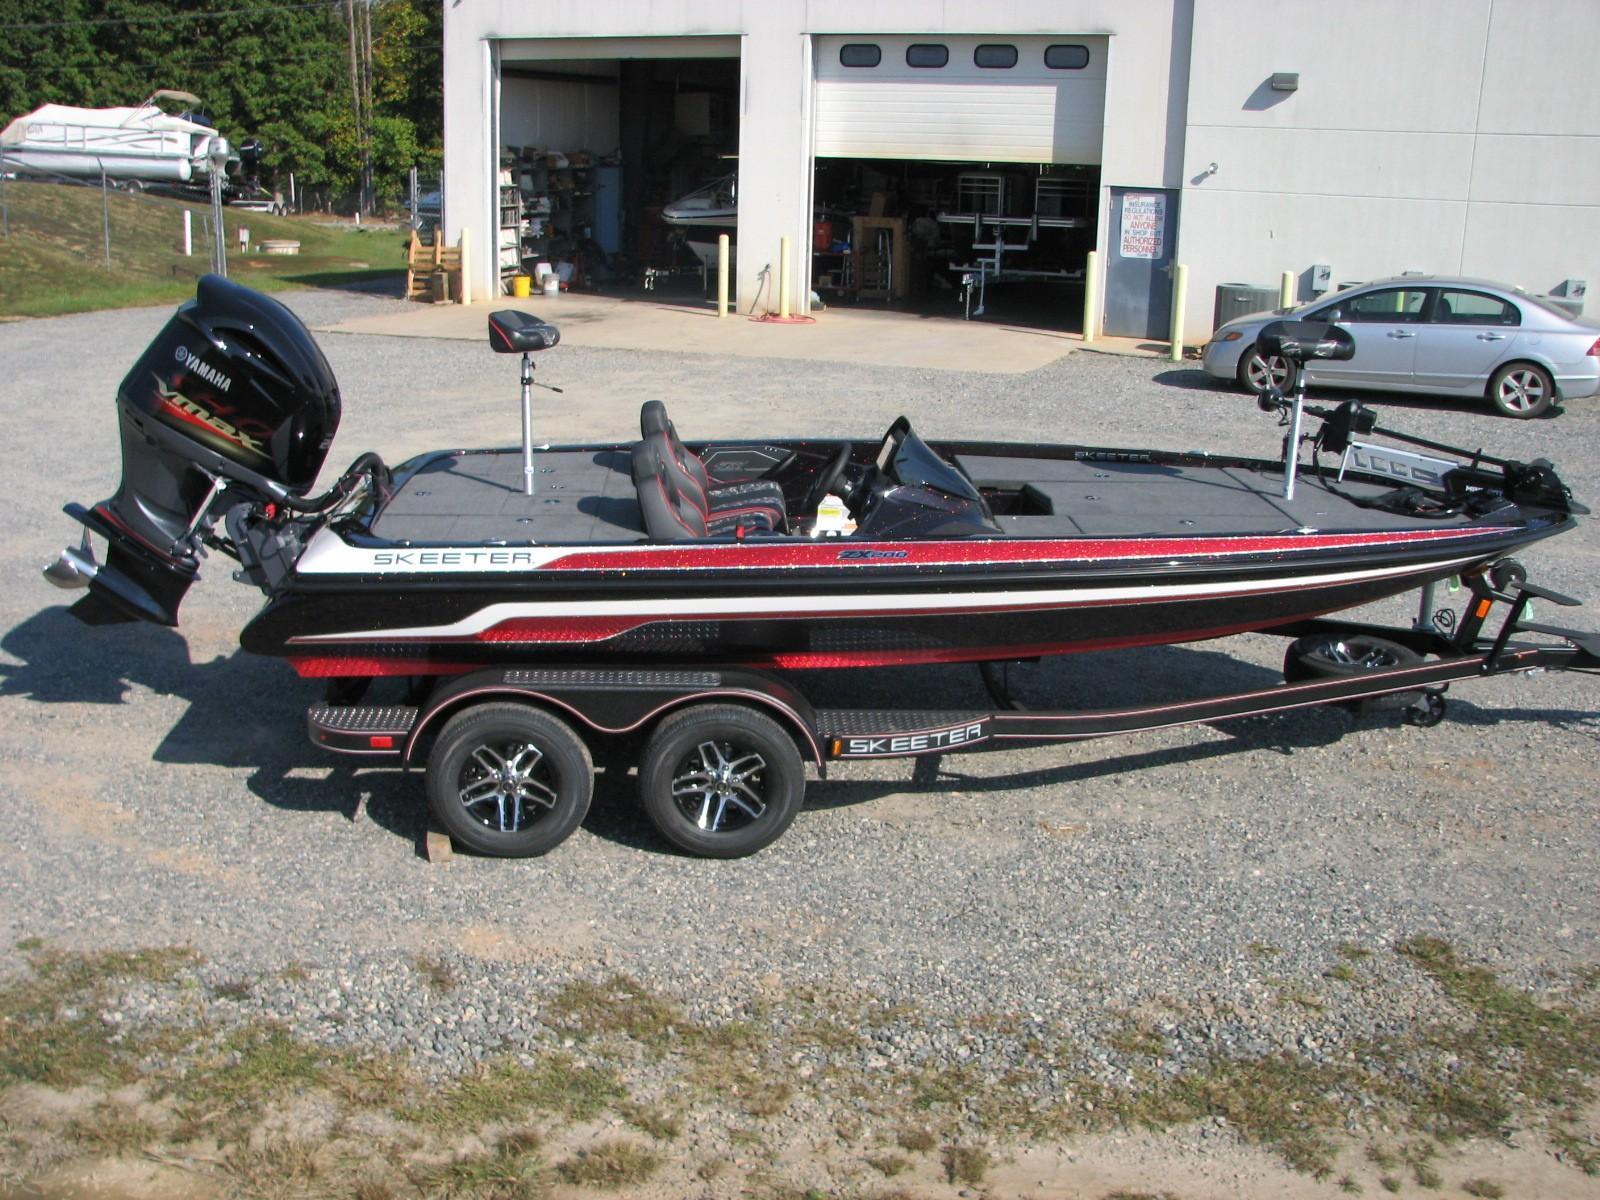 skeeter bass boat for sale - HD1600×1200